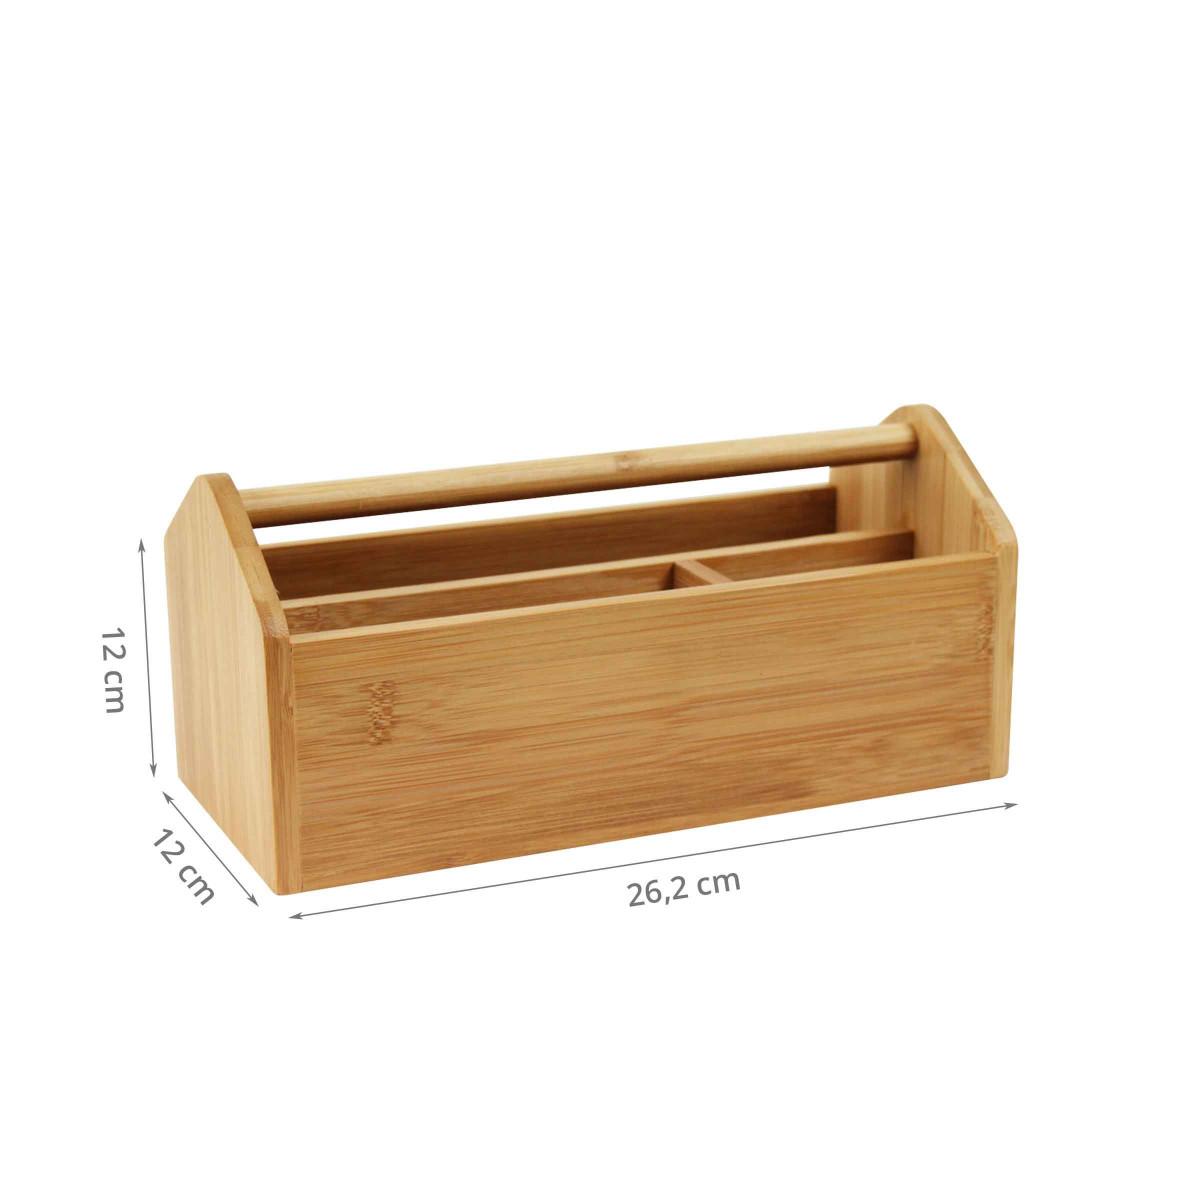 organisateur de bureau en bambou portable. Black Bedroom Furniture Sets. Home Design Ideas